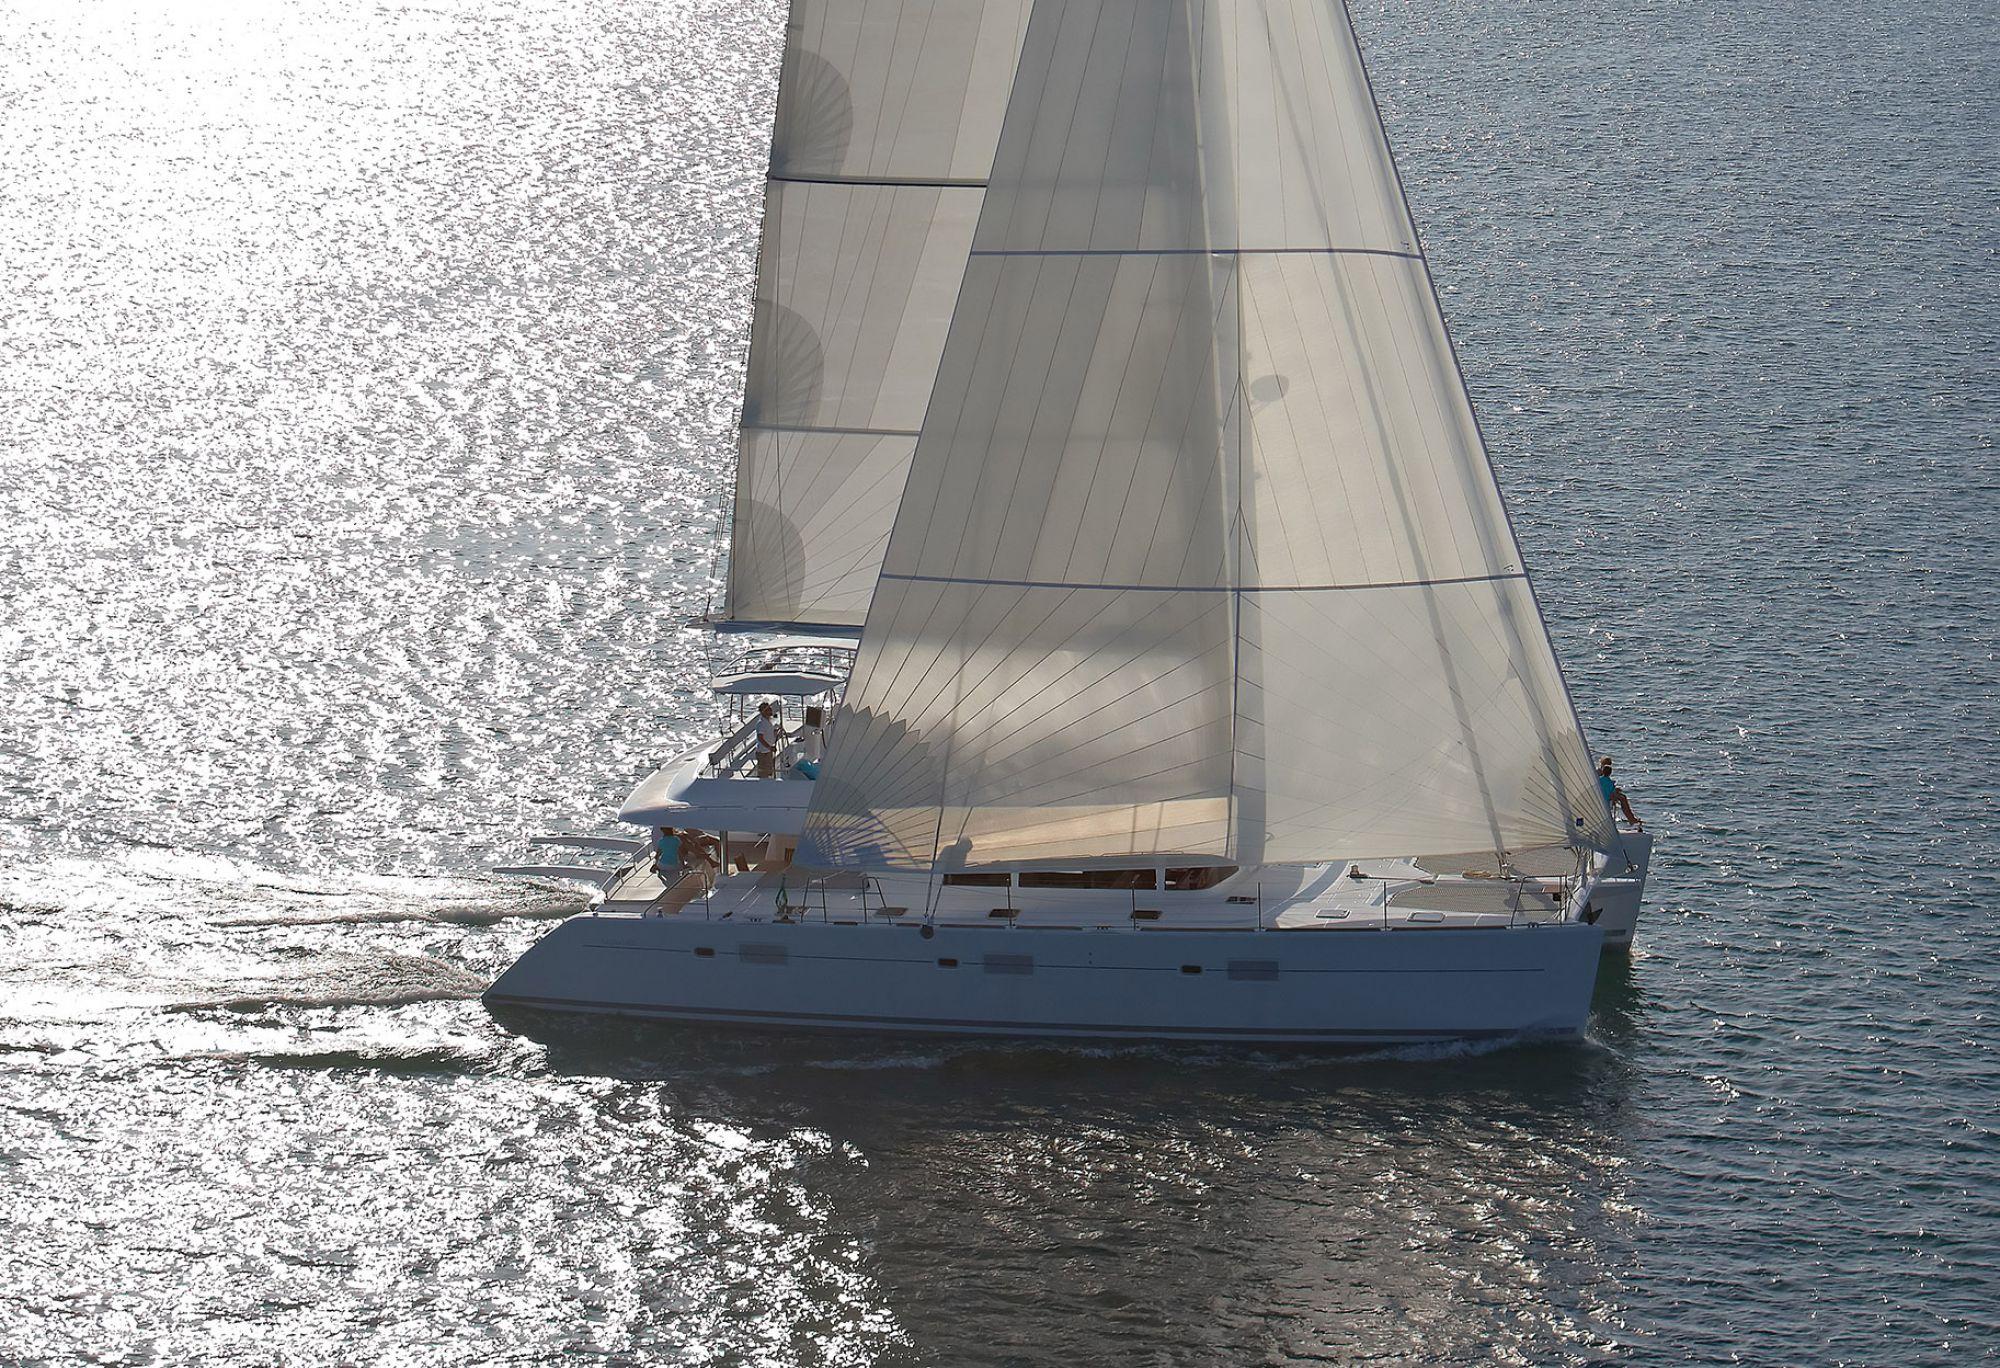 Lagoon Catamaran - Sistership To Phantom